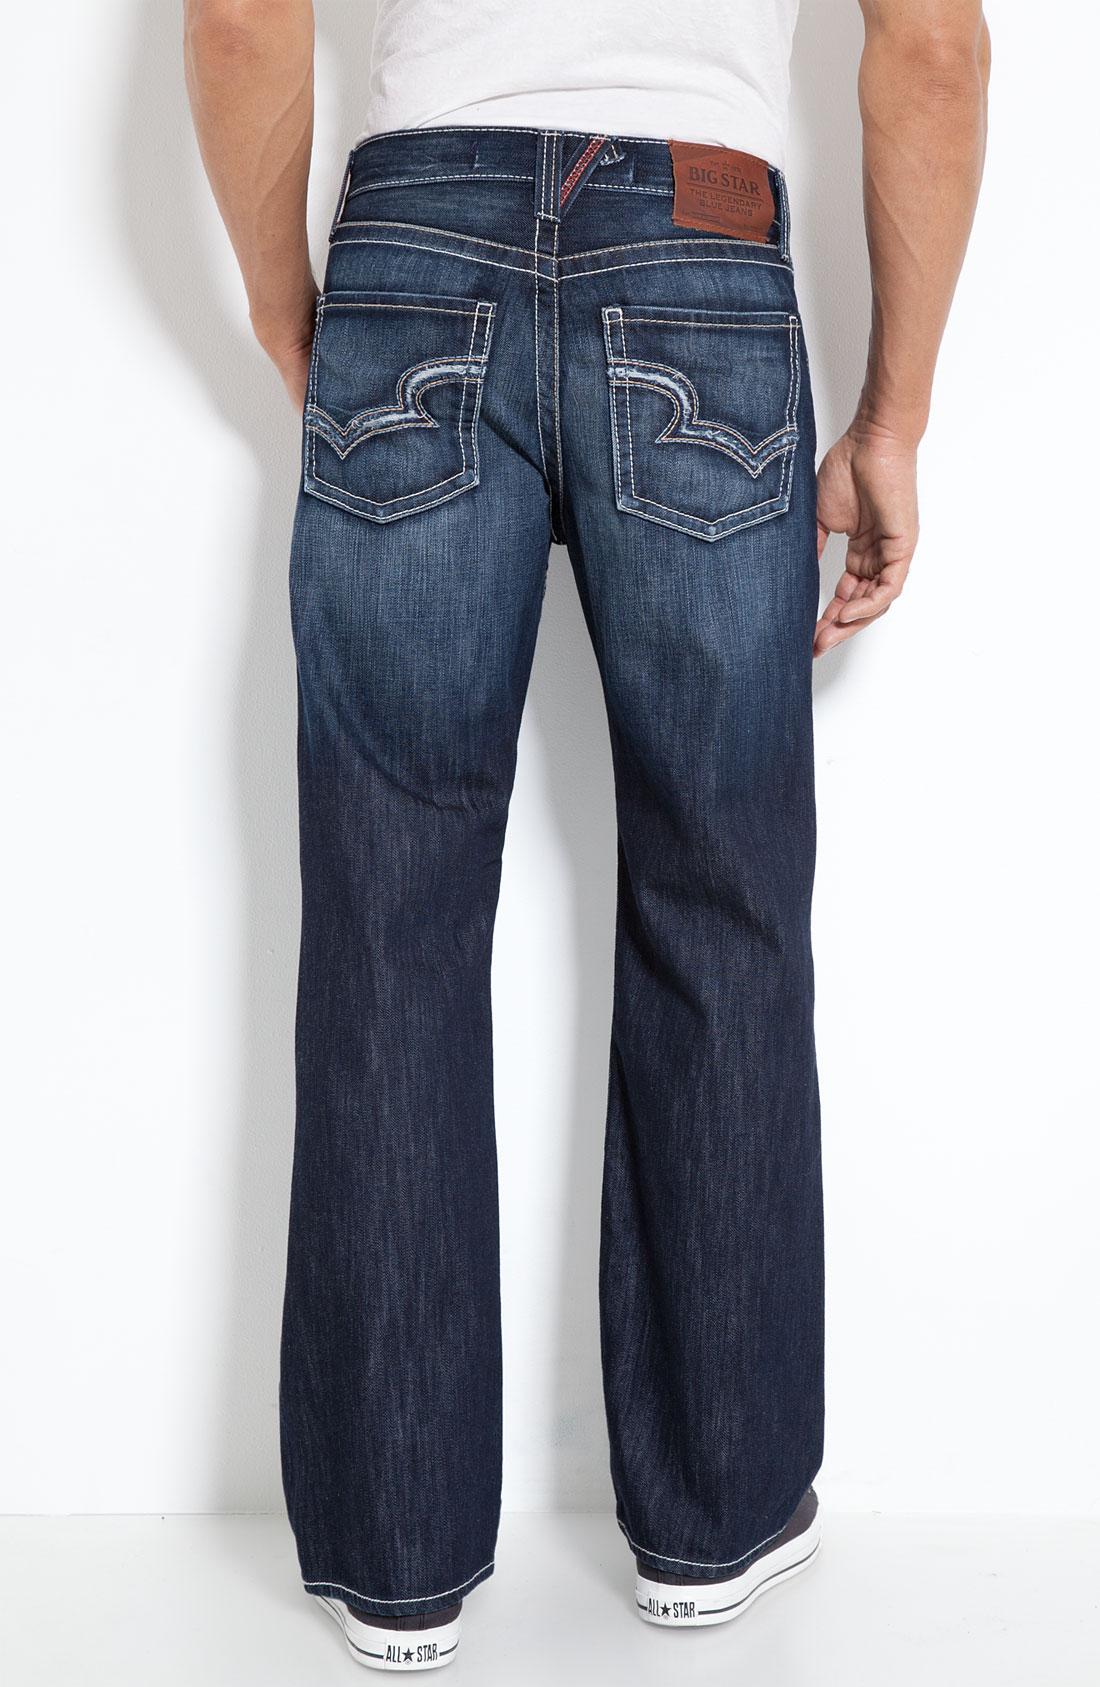 Lucky Jeans For Men